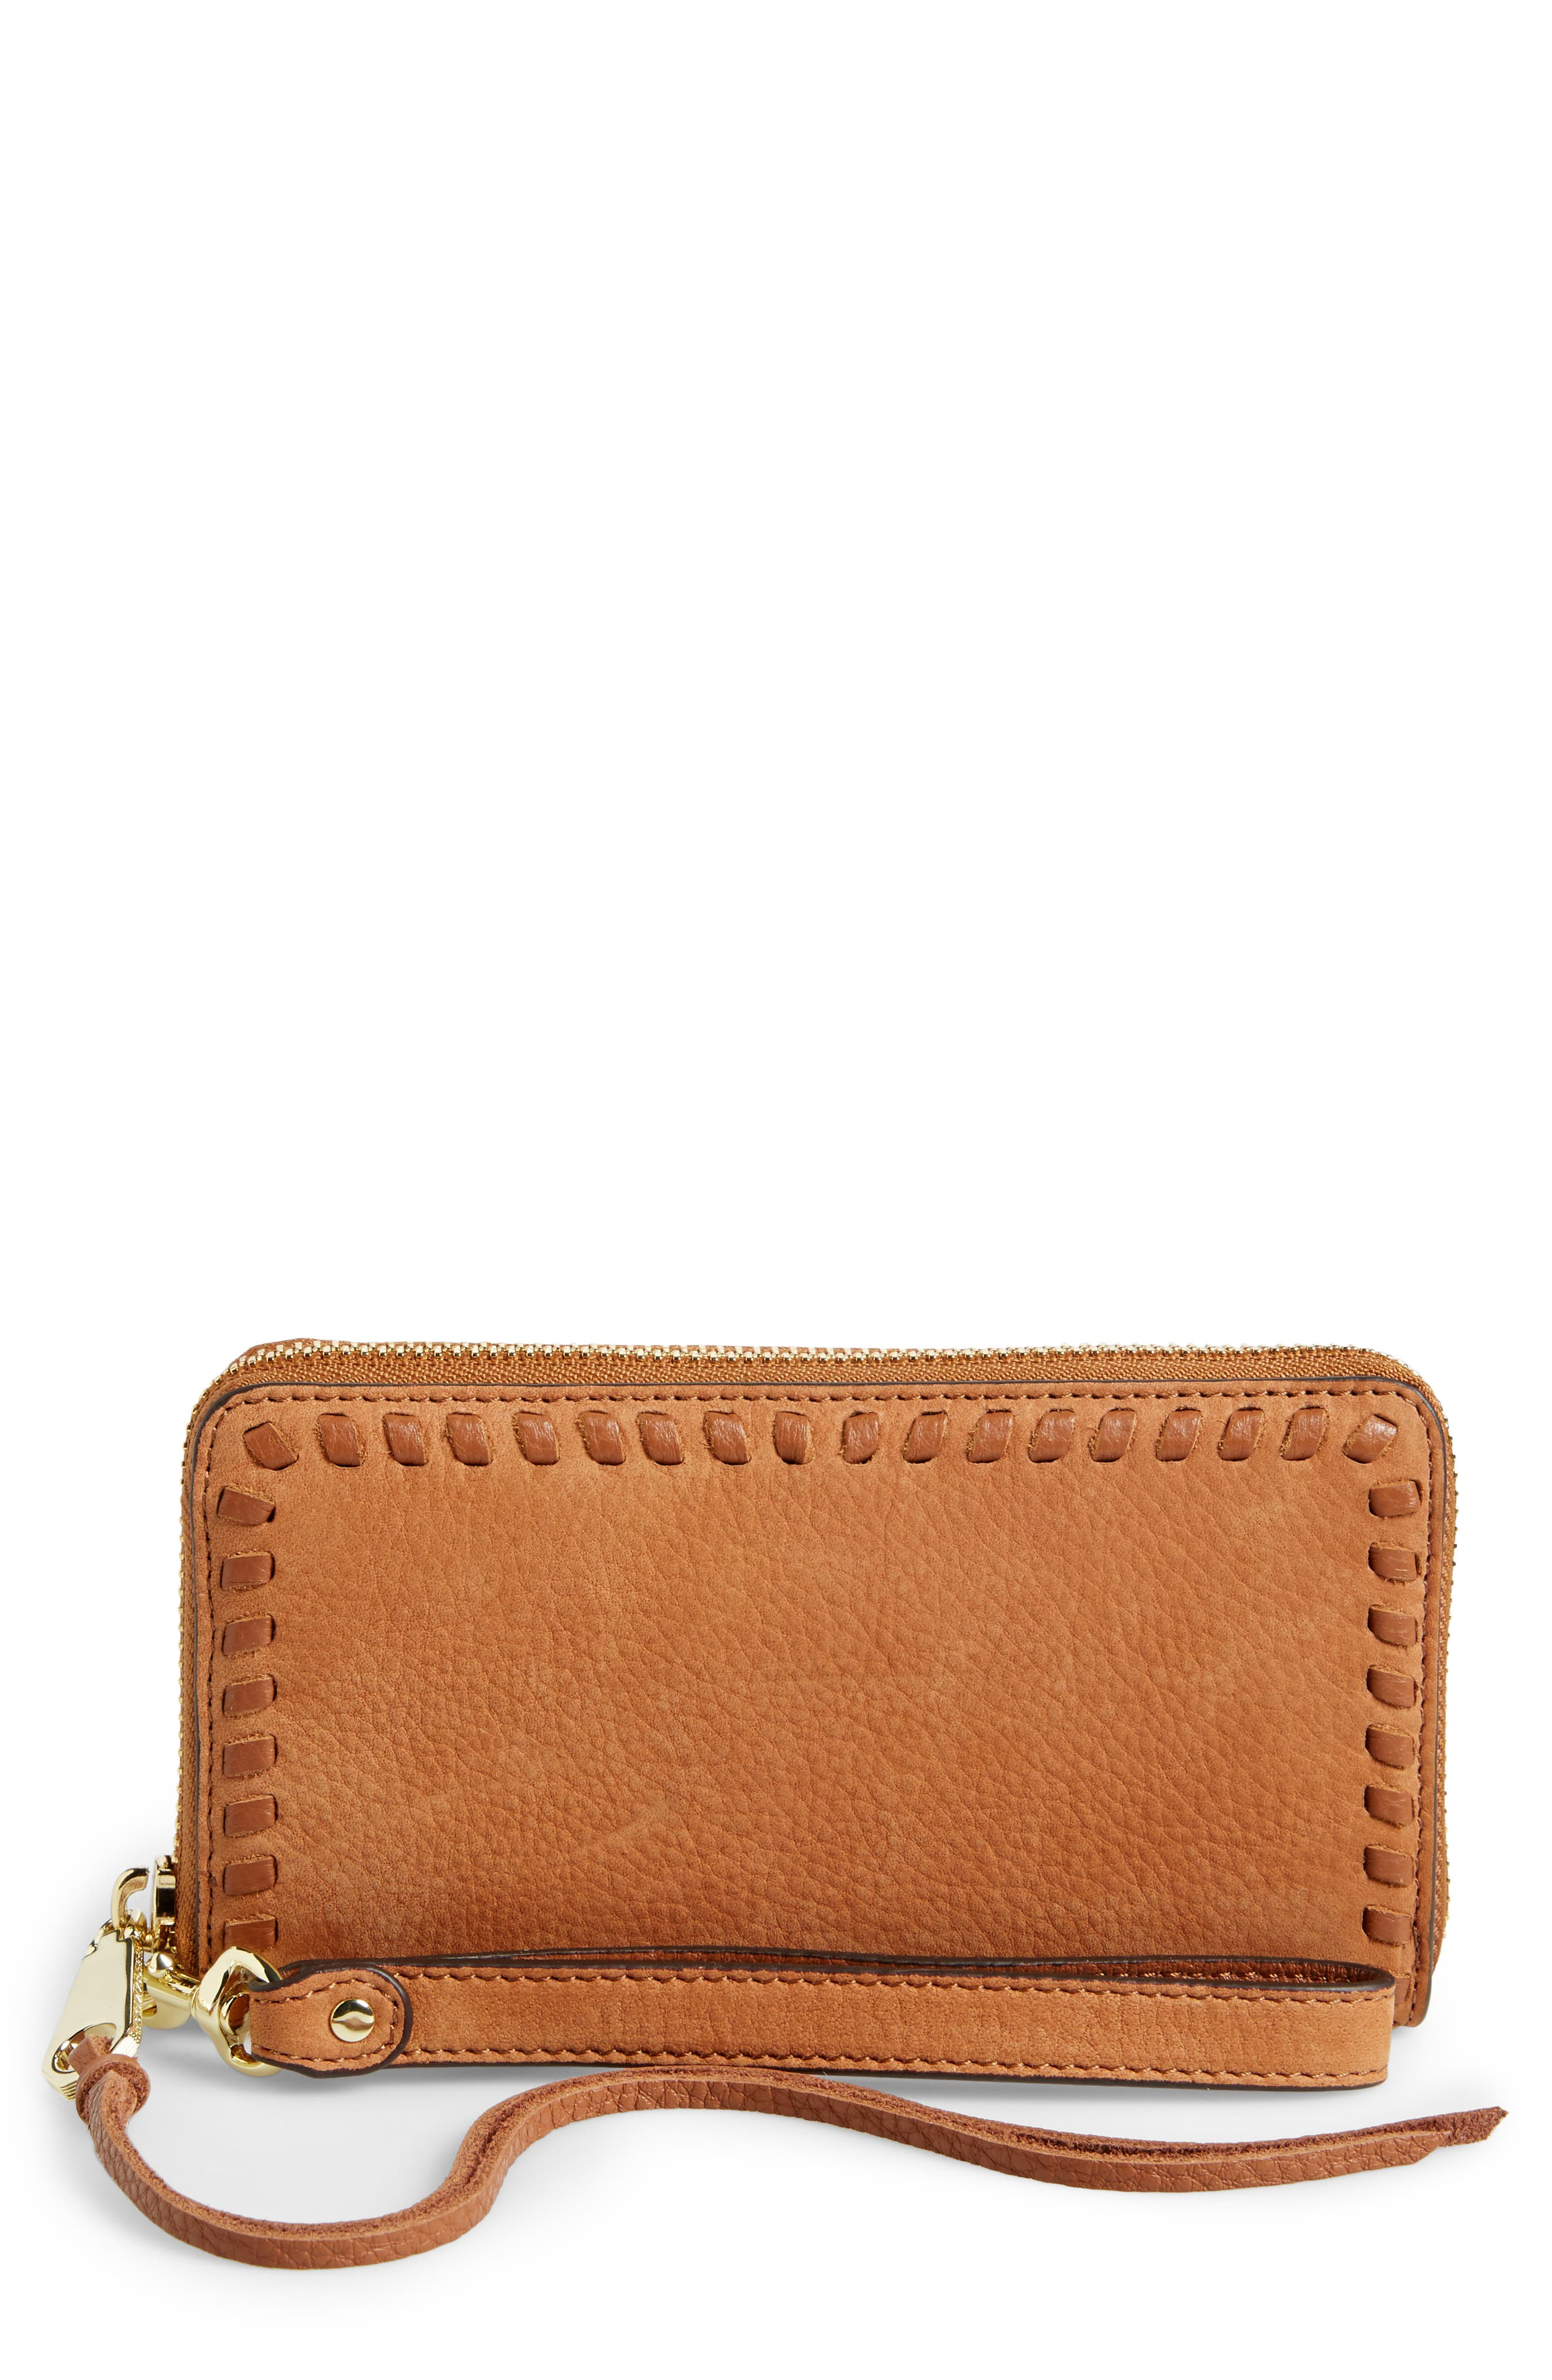 Vanity Nubuck Leather Phone Wallet,                             Main thumbnail 1, color,                             230